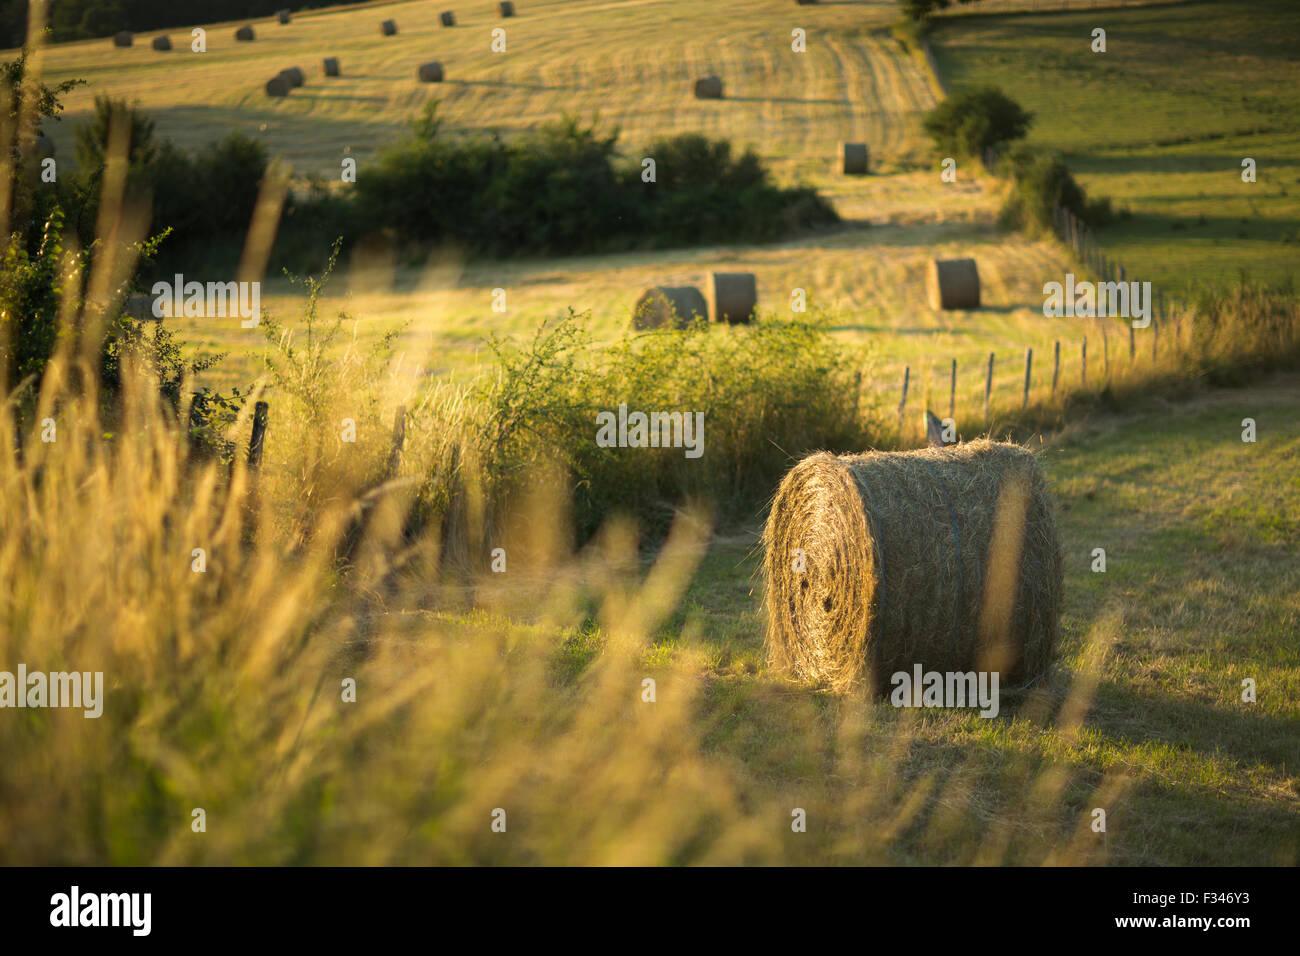 hay bales in the fields near Beaumont du Périgord, Pays de Bergerac, Dordogne, Aquitaine, France Stock Photo